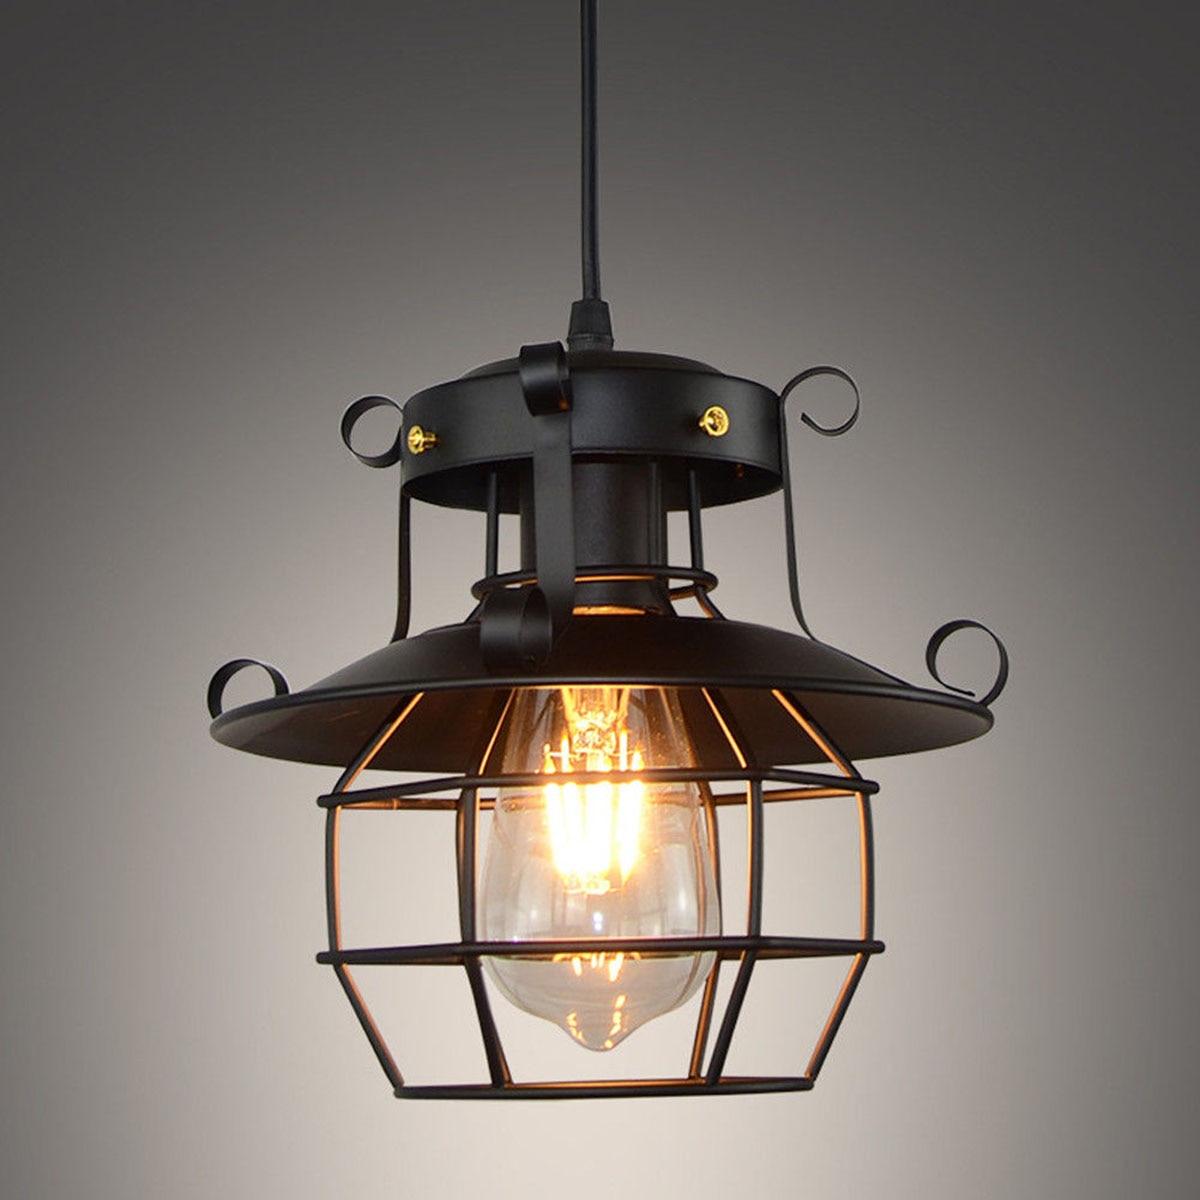 industrial pendurado lâmpada luz teto luminárias lustre